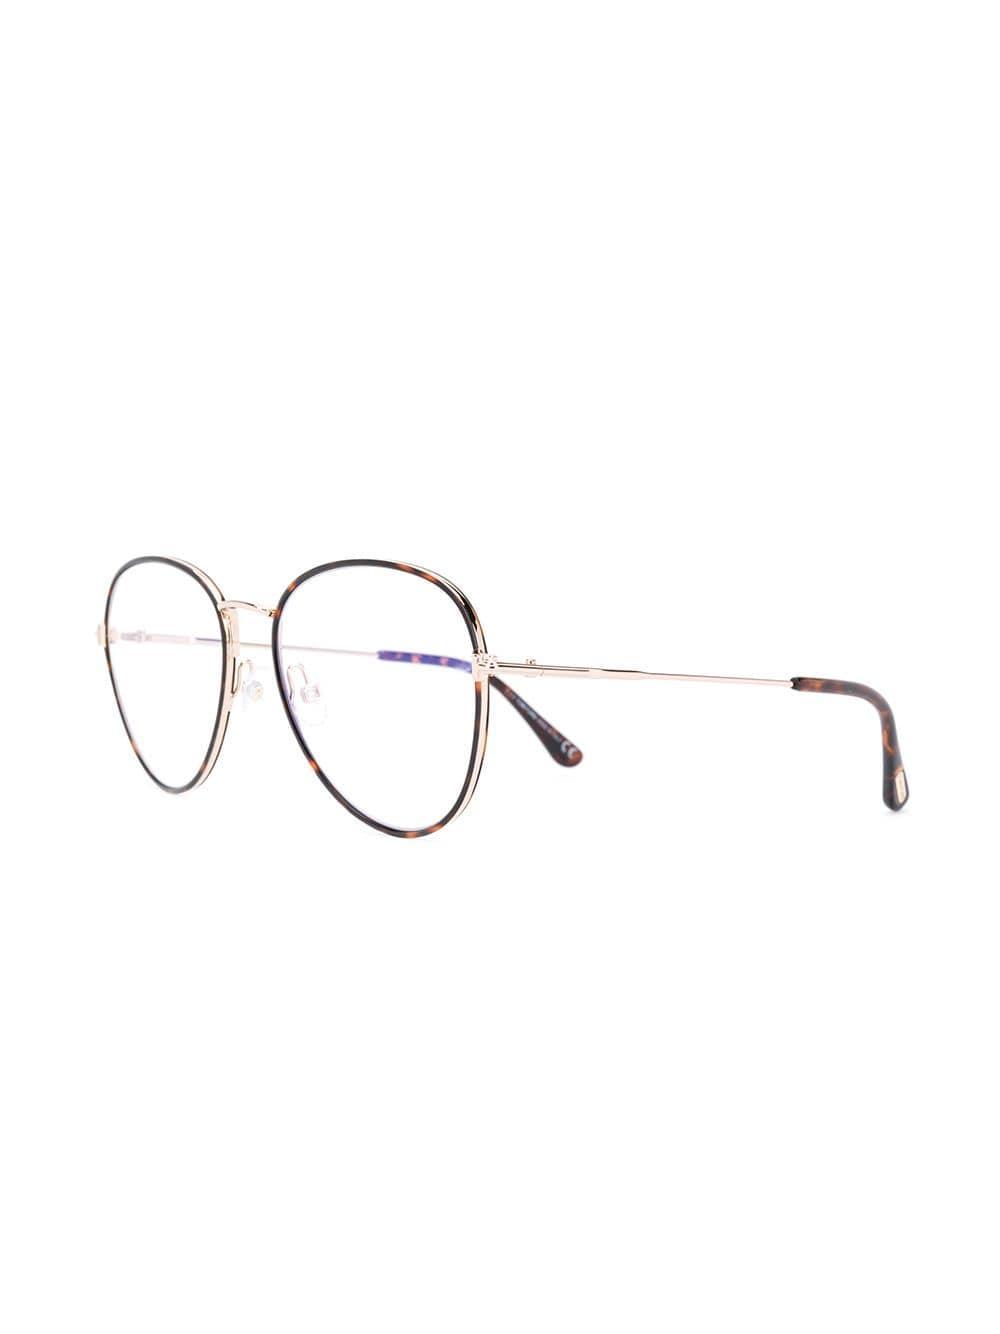 772c8a79ded4 Tom Ford Tortoiseshell Thin Frame Glasses in Brown - Lyst